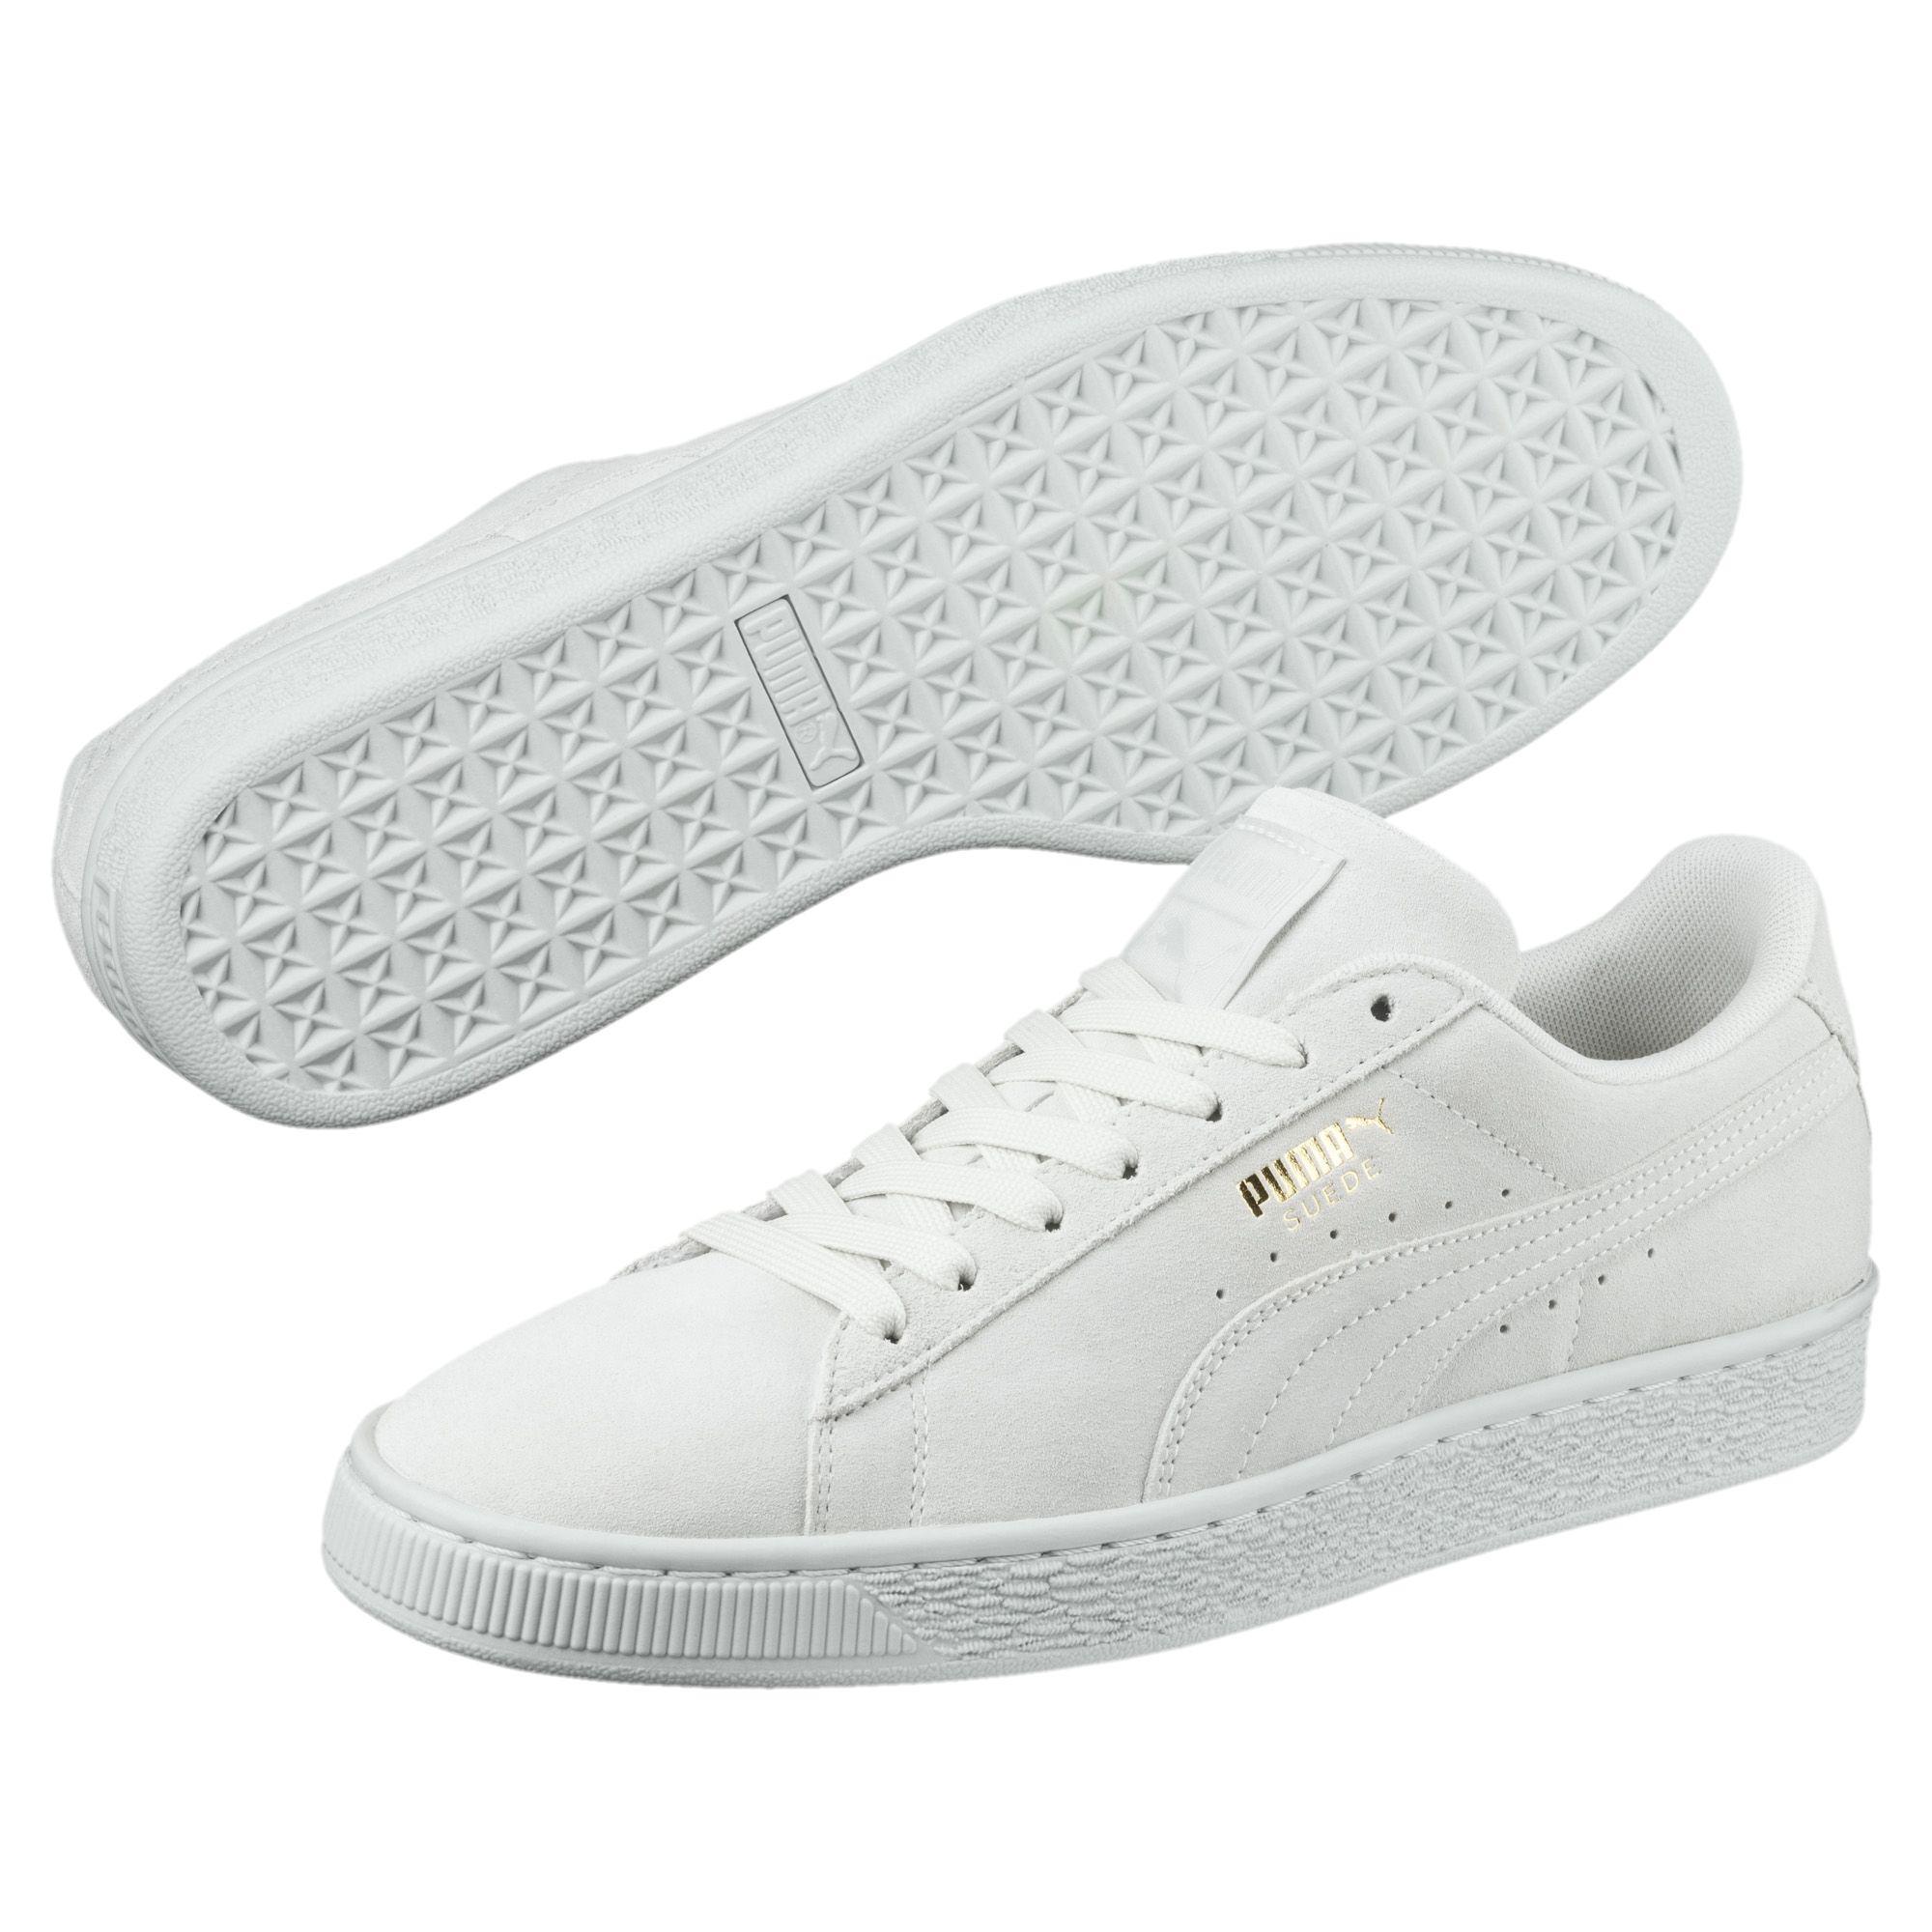 Lyst - PUMA Suede Classic Tonal Sneakers in Blue for Men a8683d2f1